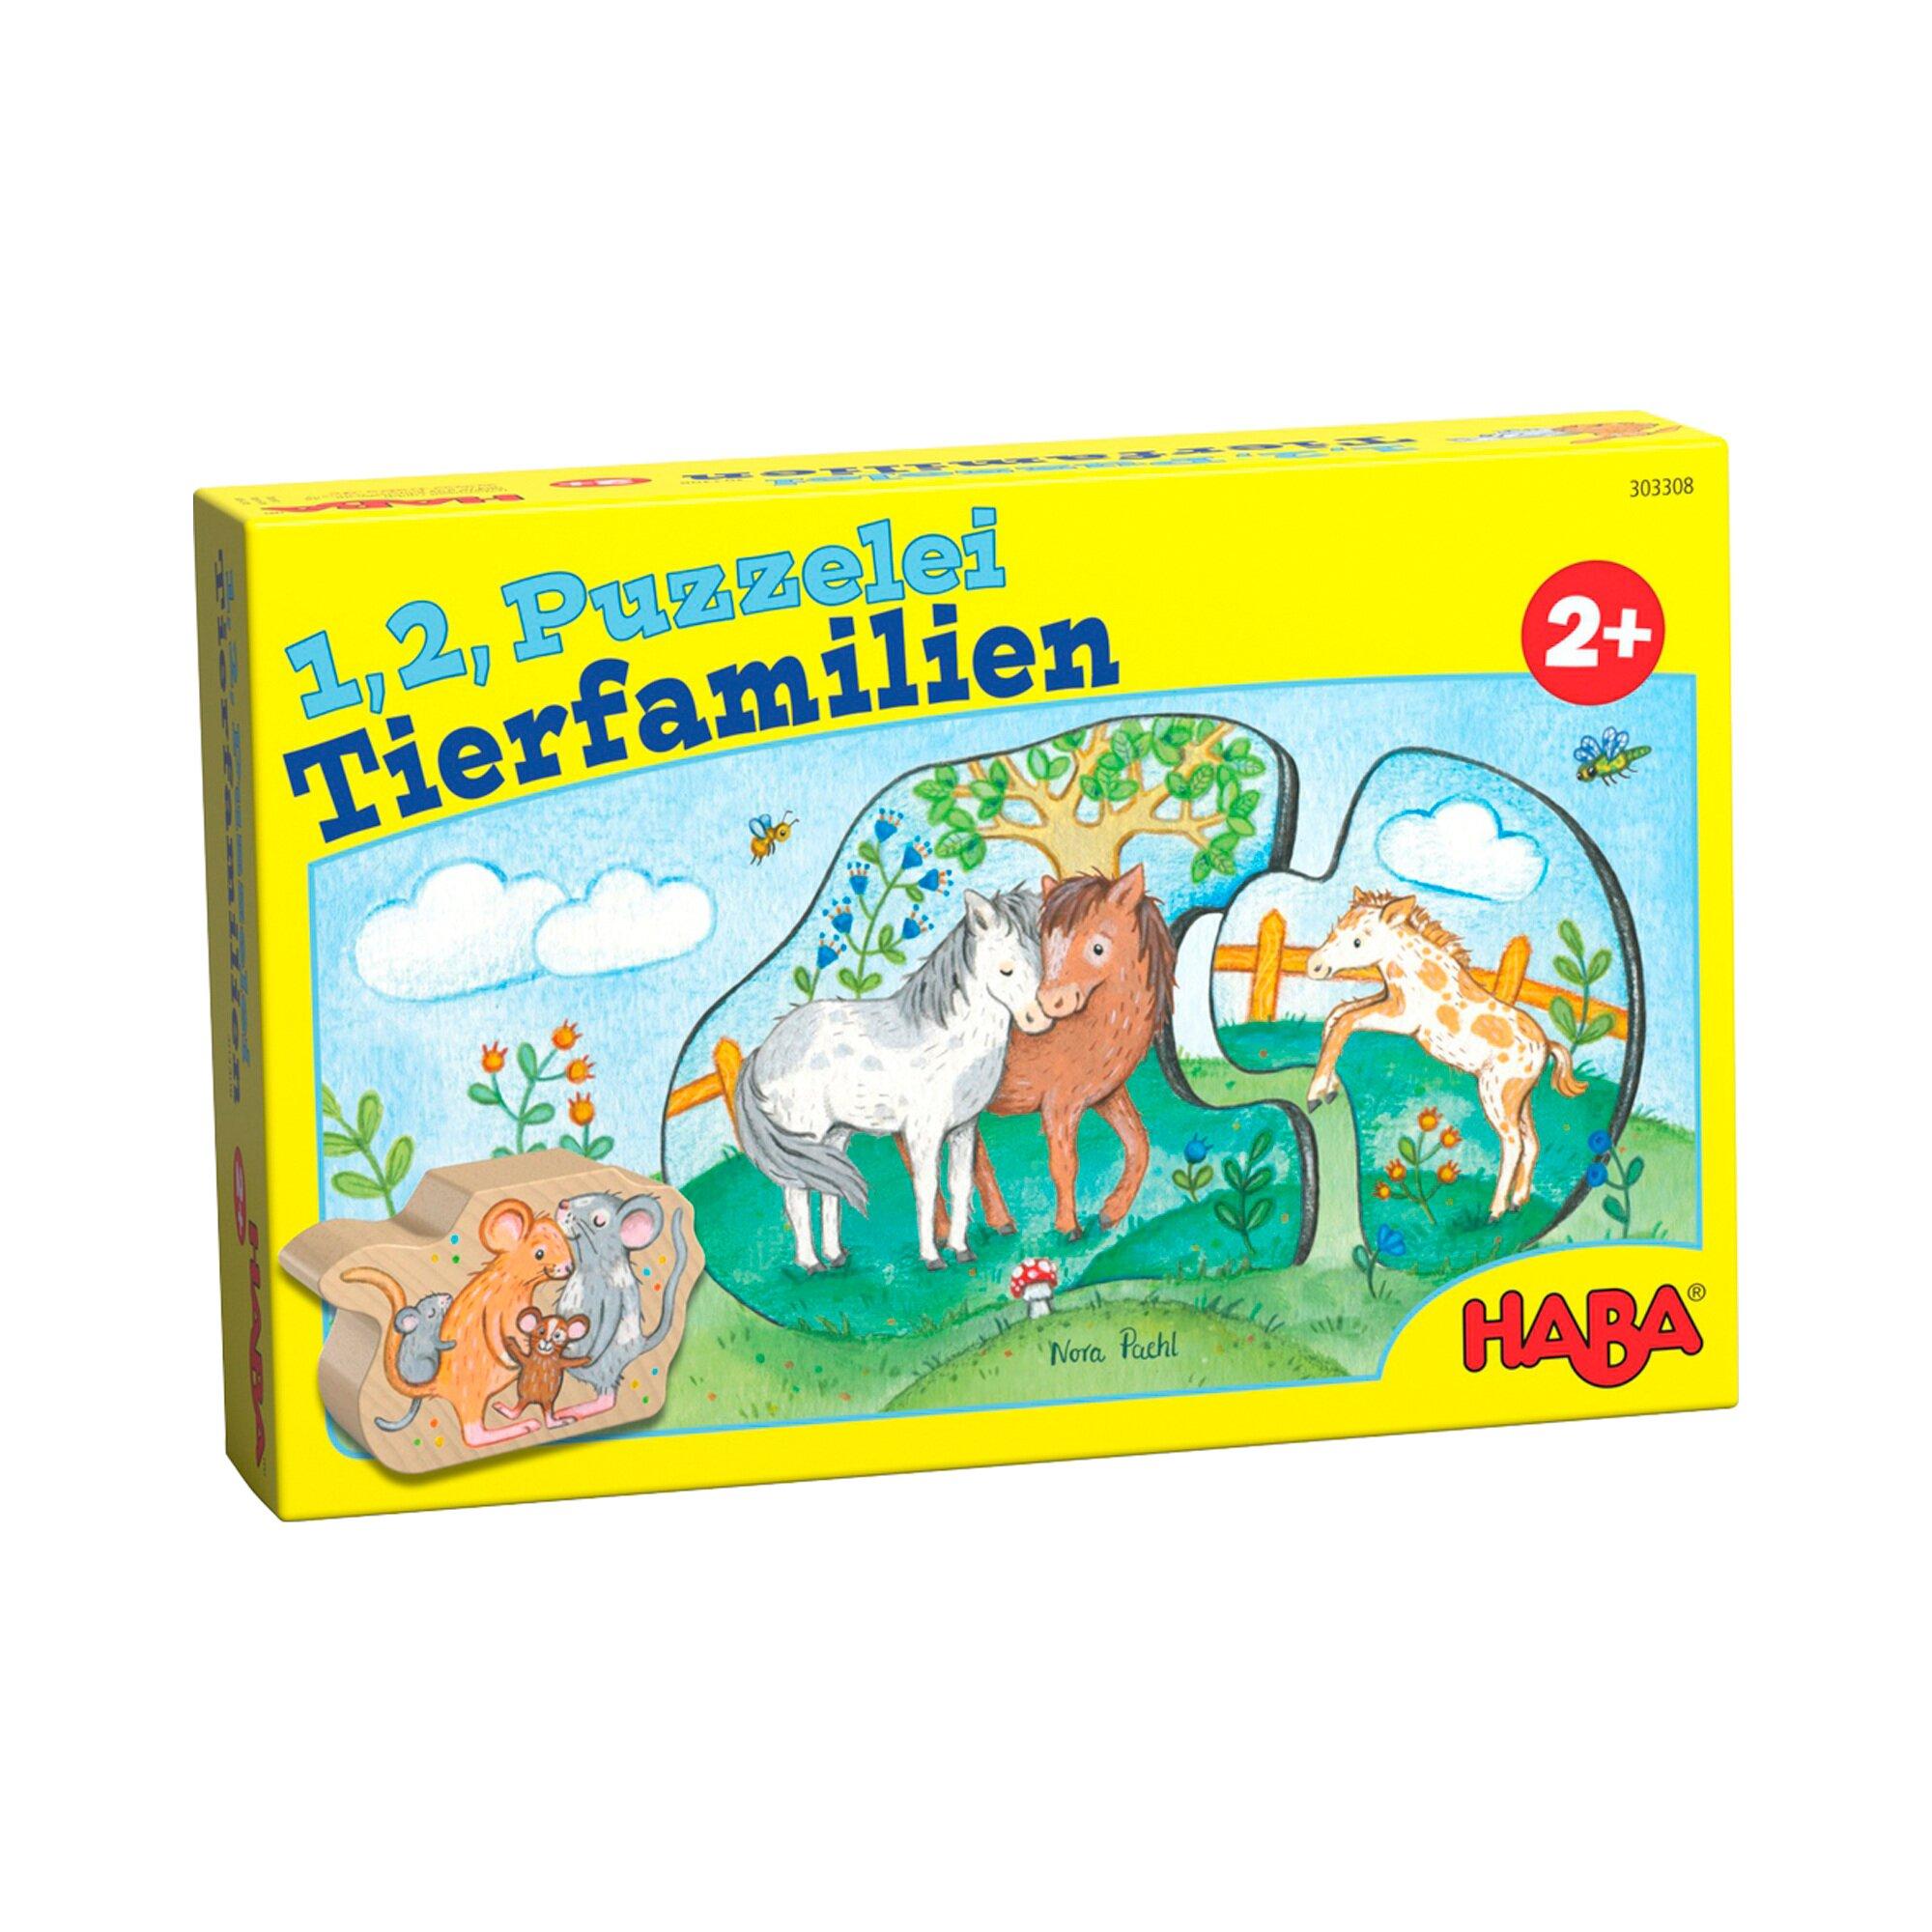 Haba Puzzle - 1, 2, Puzzelei Tierfamilien